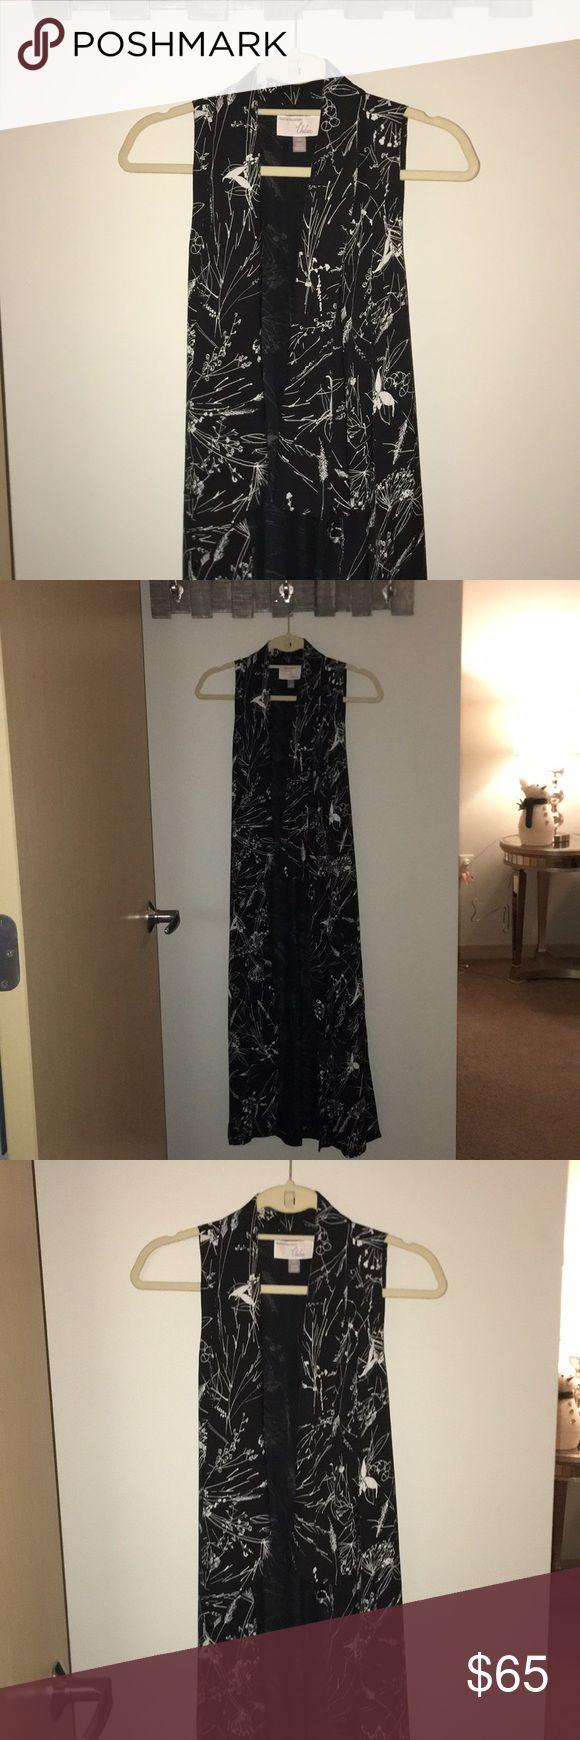 Olivia Palermo's Chelsea 28 Long Shrug Beautiful black and white Floral shrug Chelsea28 Jackets & Coats Vests